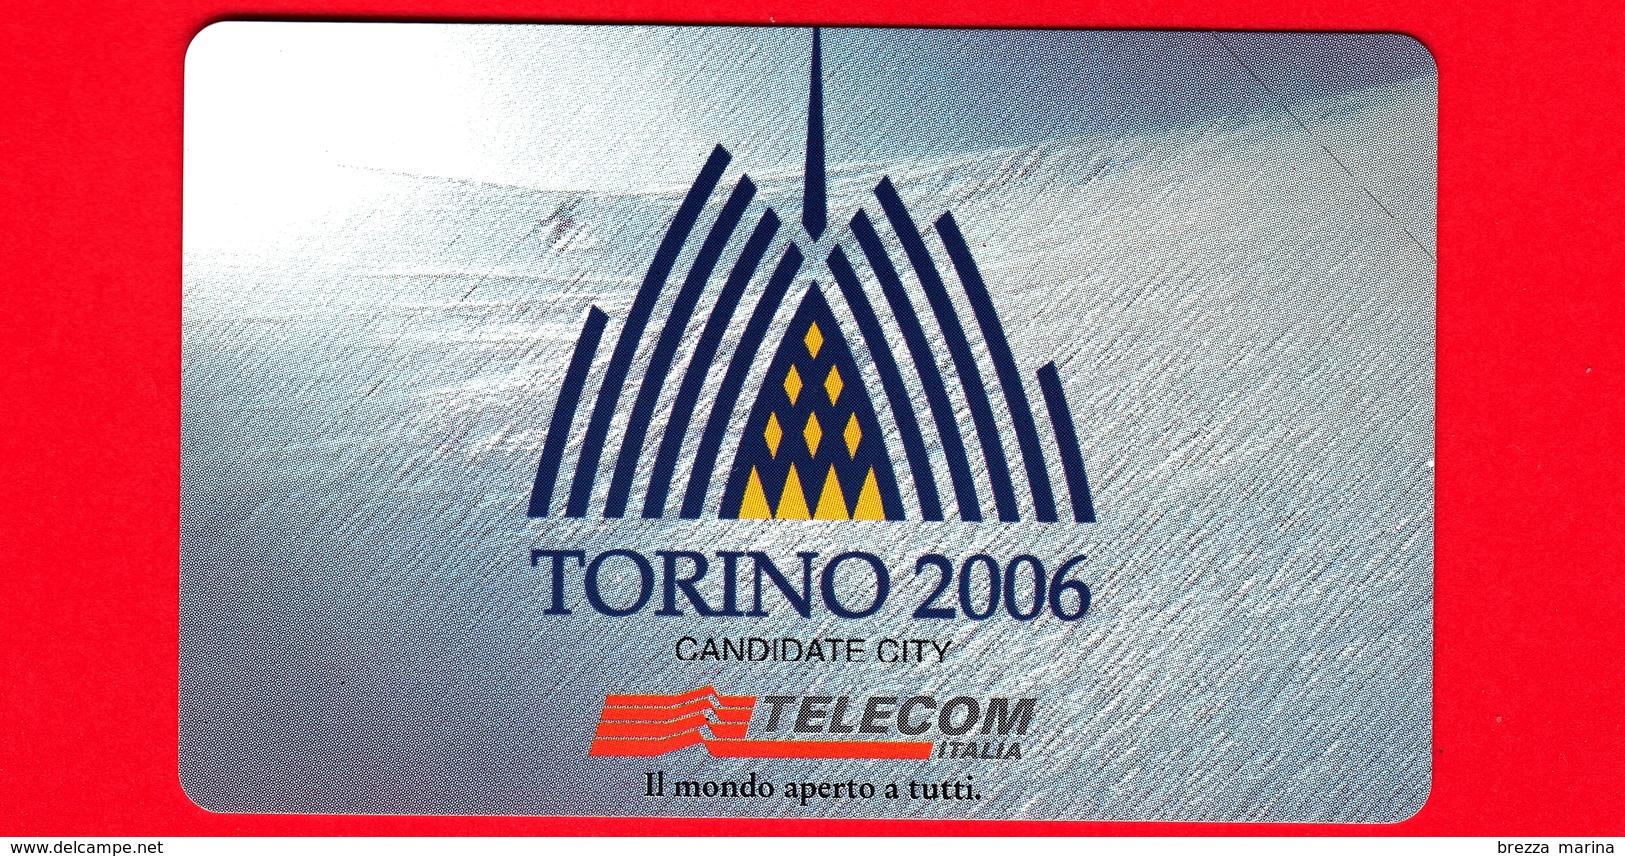 Nuova - MNH - ITALIA - Scheda Telefonica - Telecom - Torino 2006 - OCR 17 - C&C 3075  - Golden 959 - Fouten & Varianten